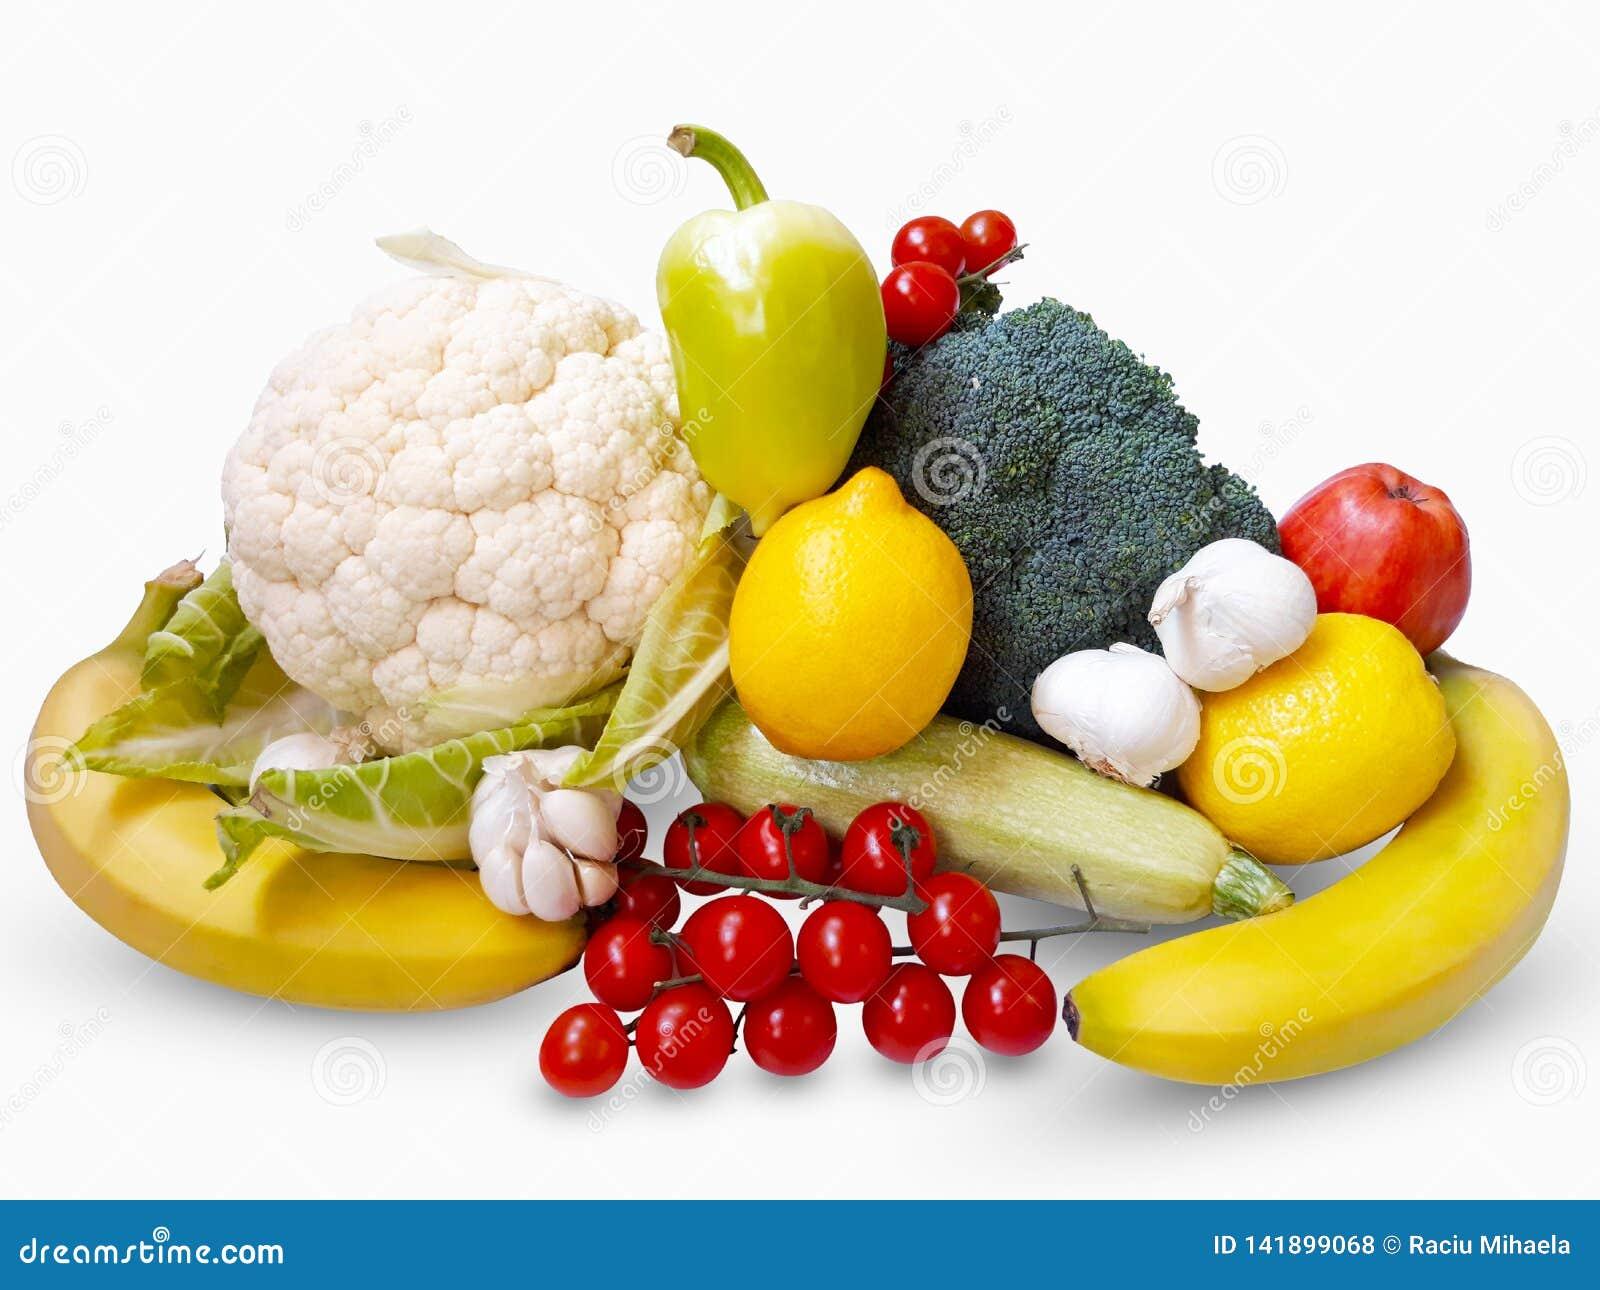 Verse groenten en vruchten op witte achtergrond